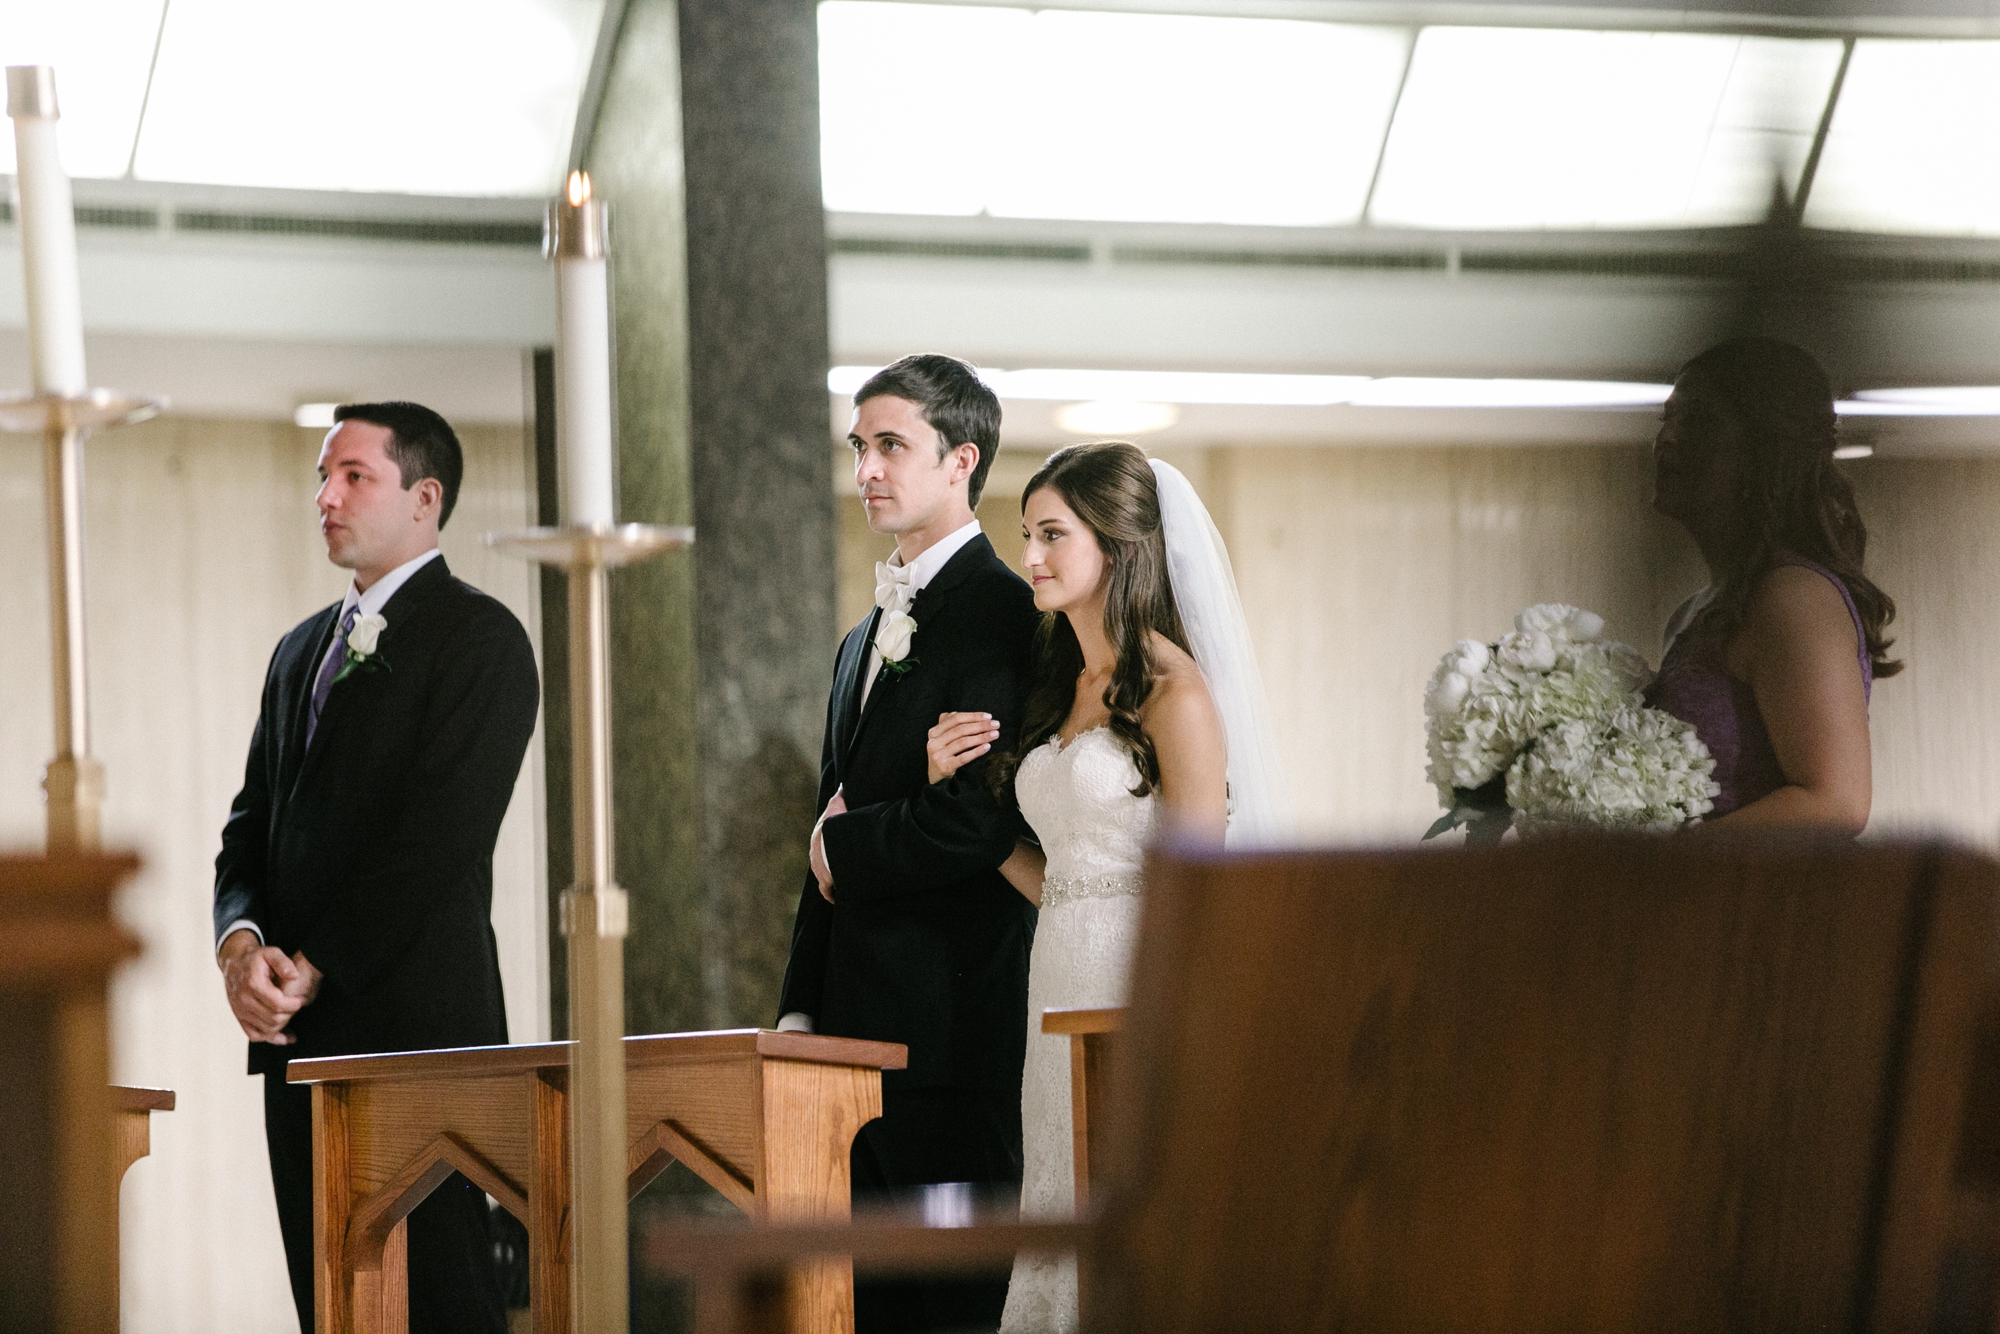 New_Orleans_Wedding_Photographer_1008.jpg